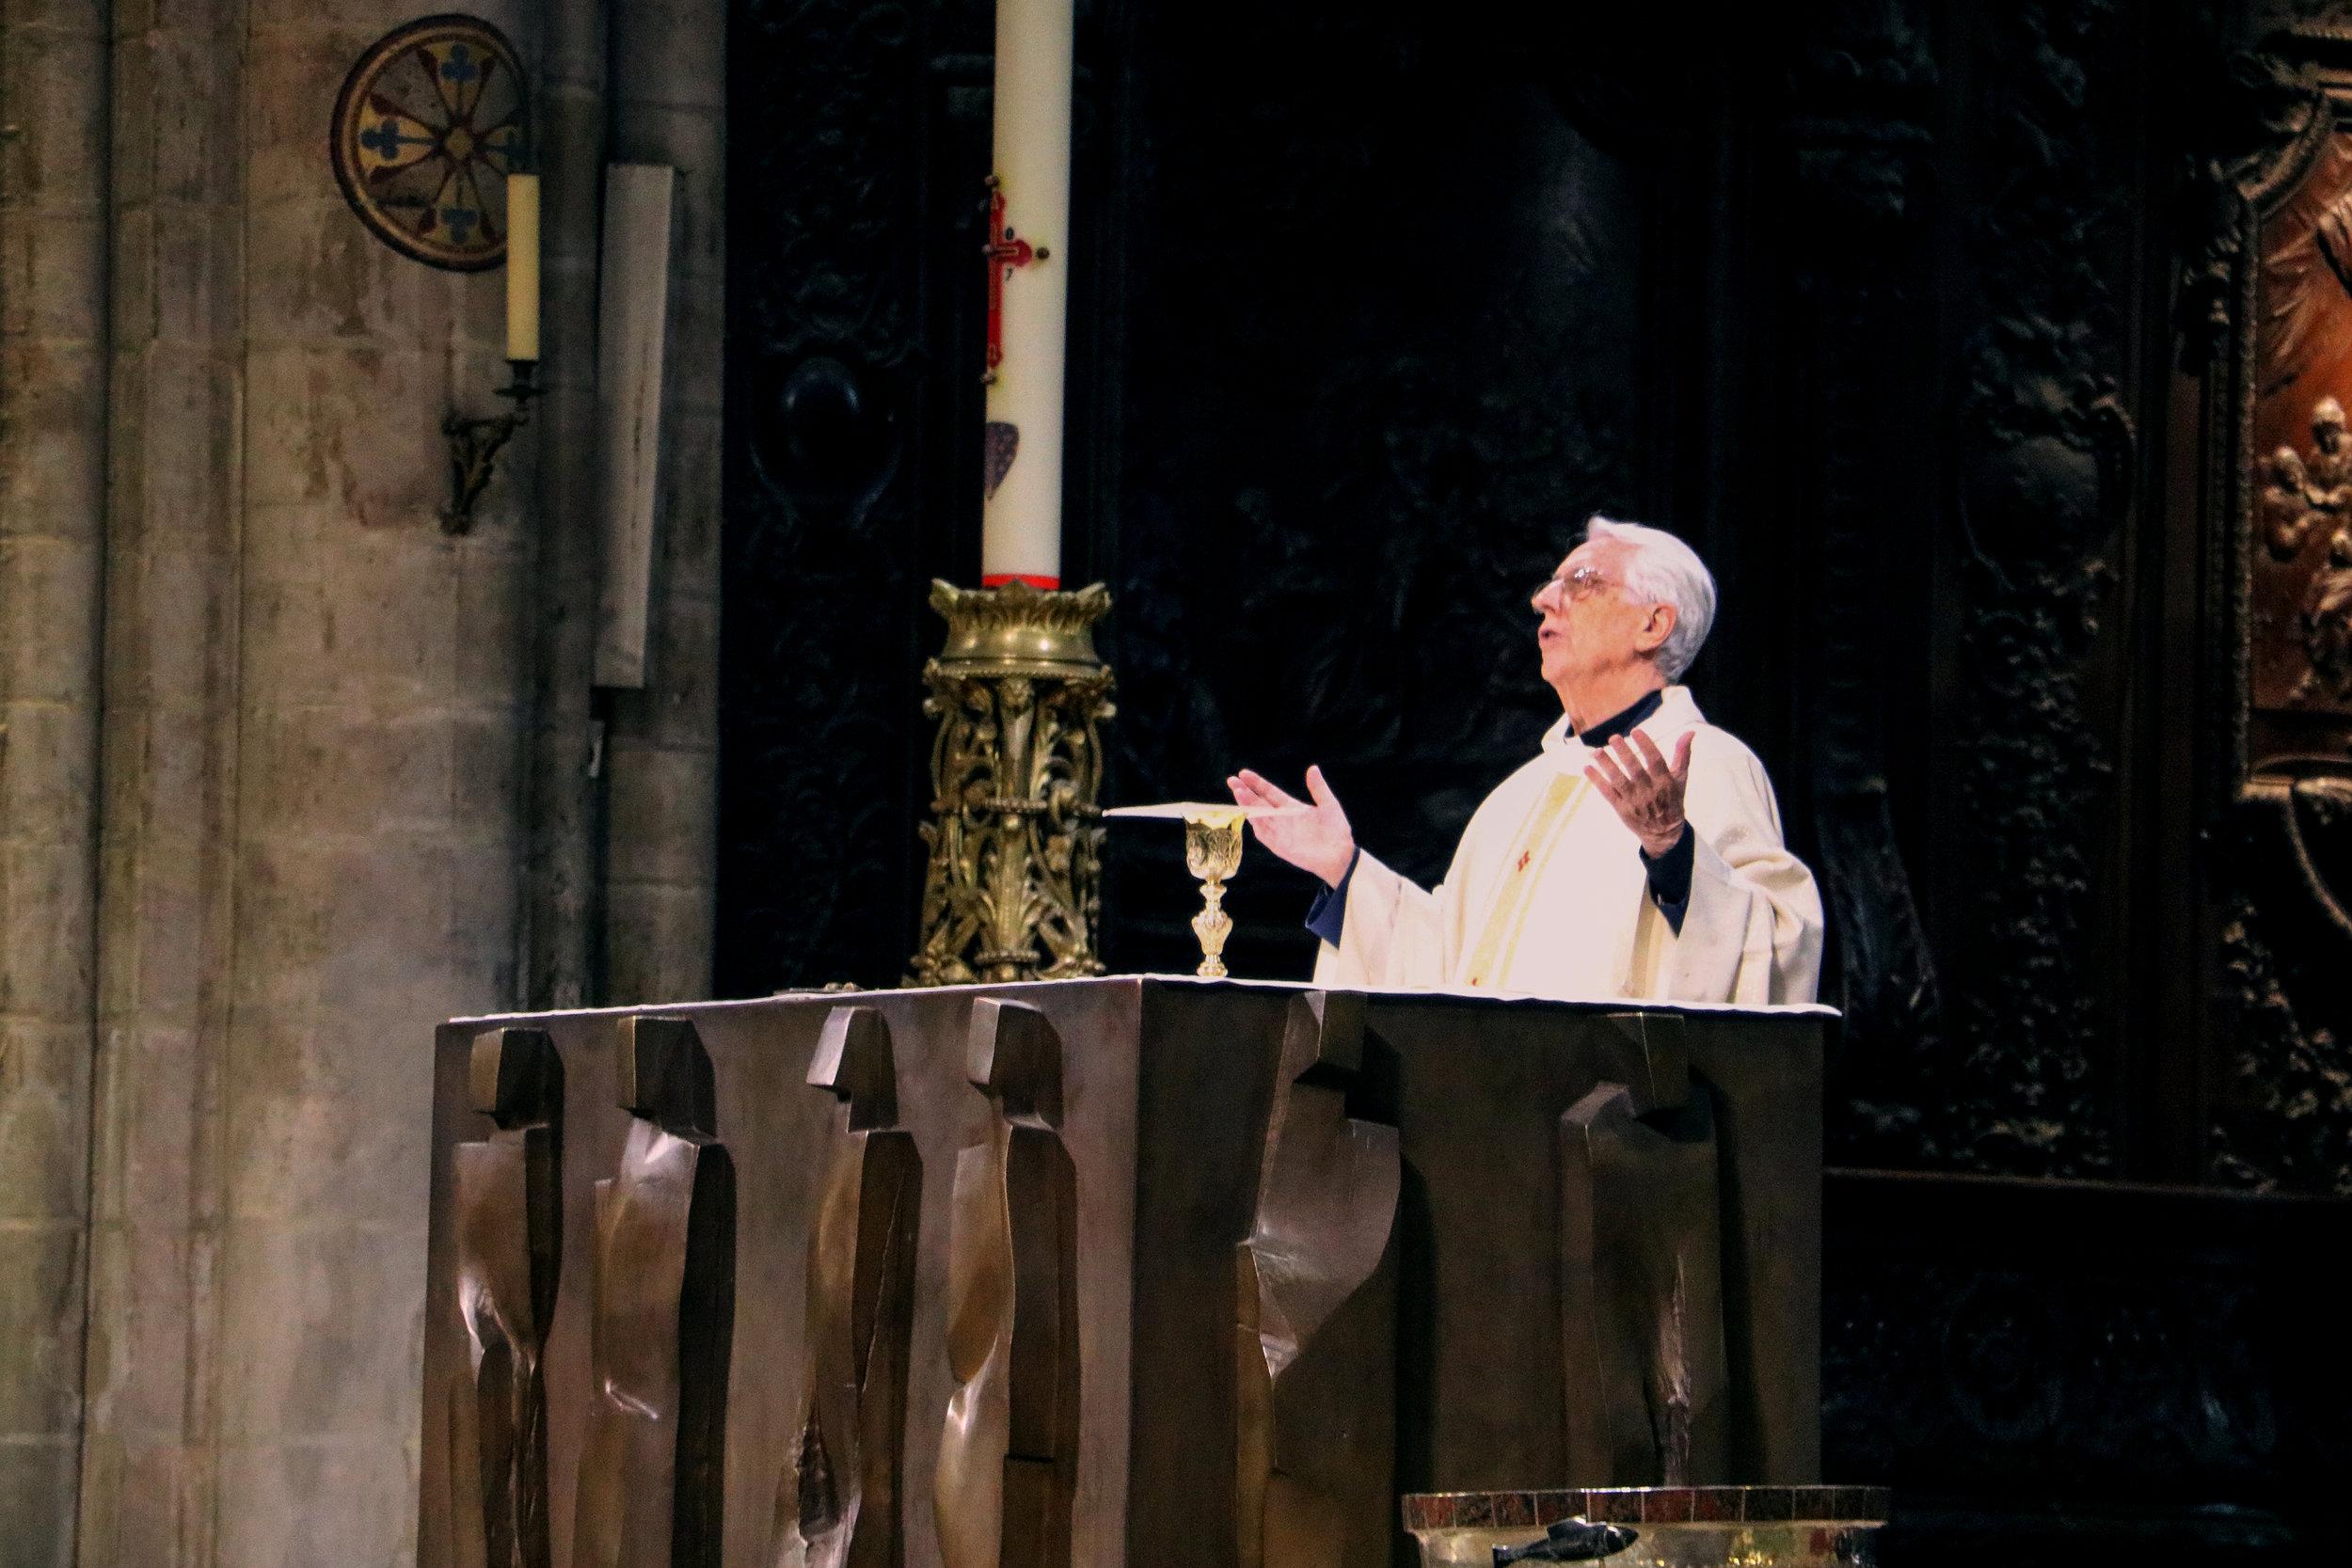 Mass at Notre Dame de Paris © Mora Mora Photography